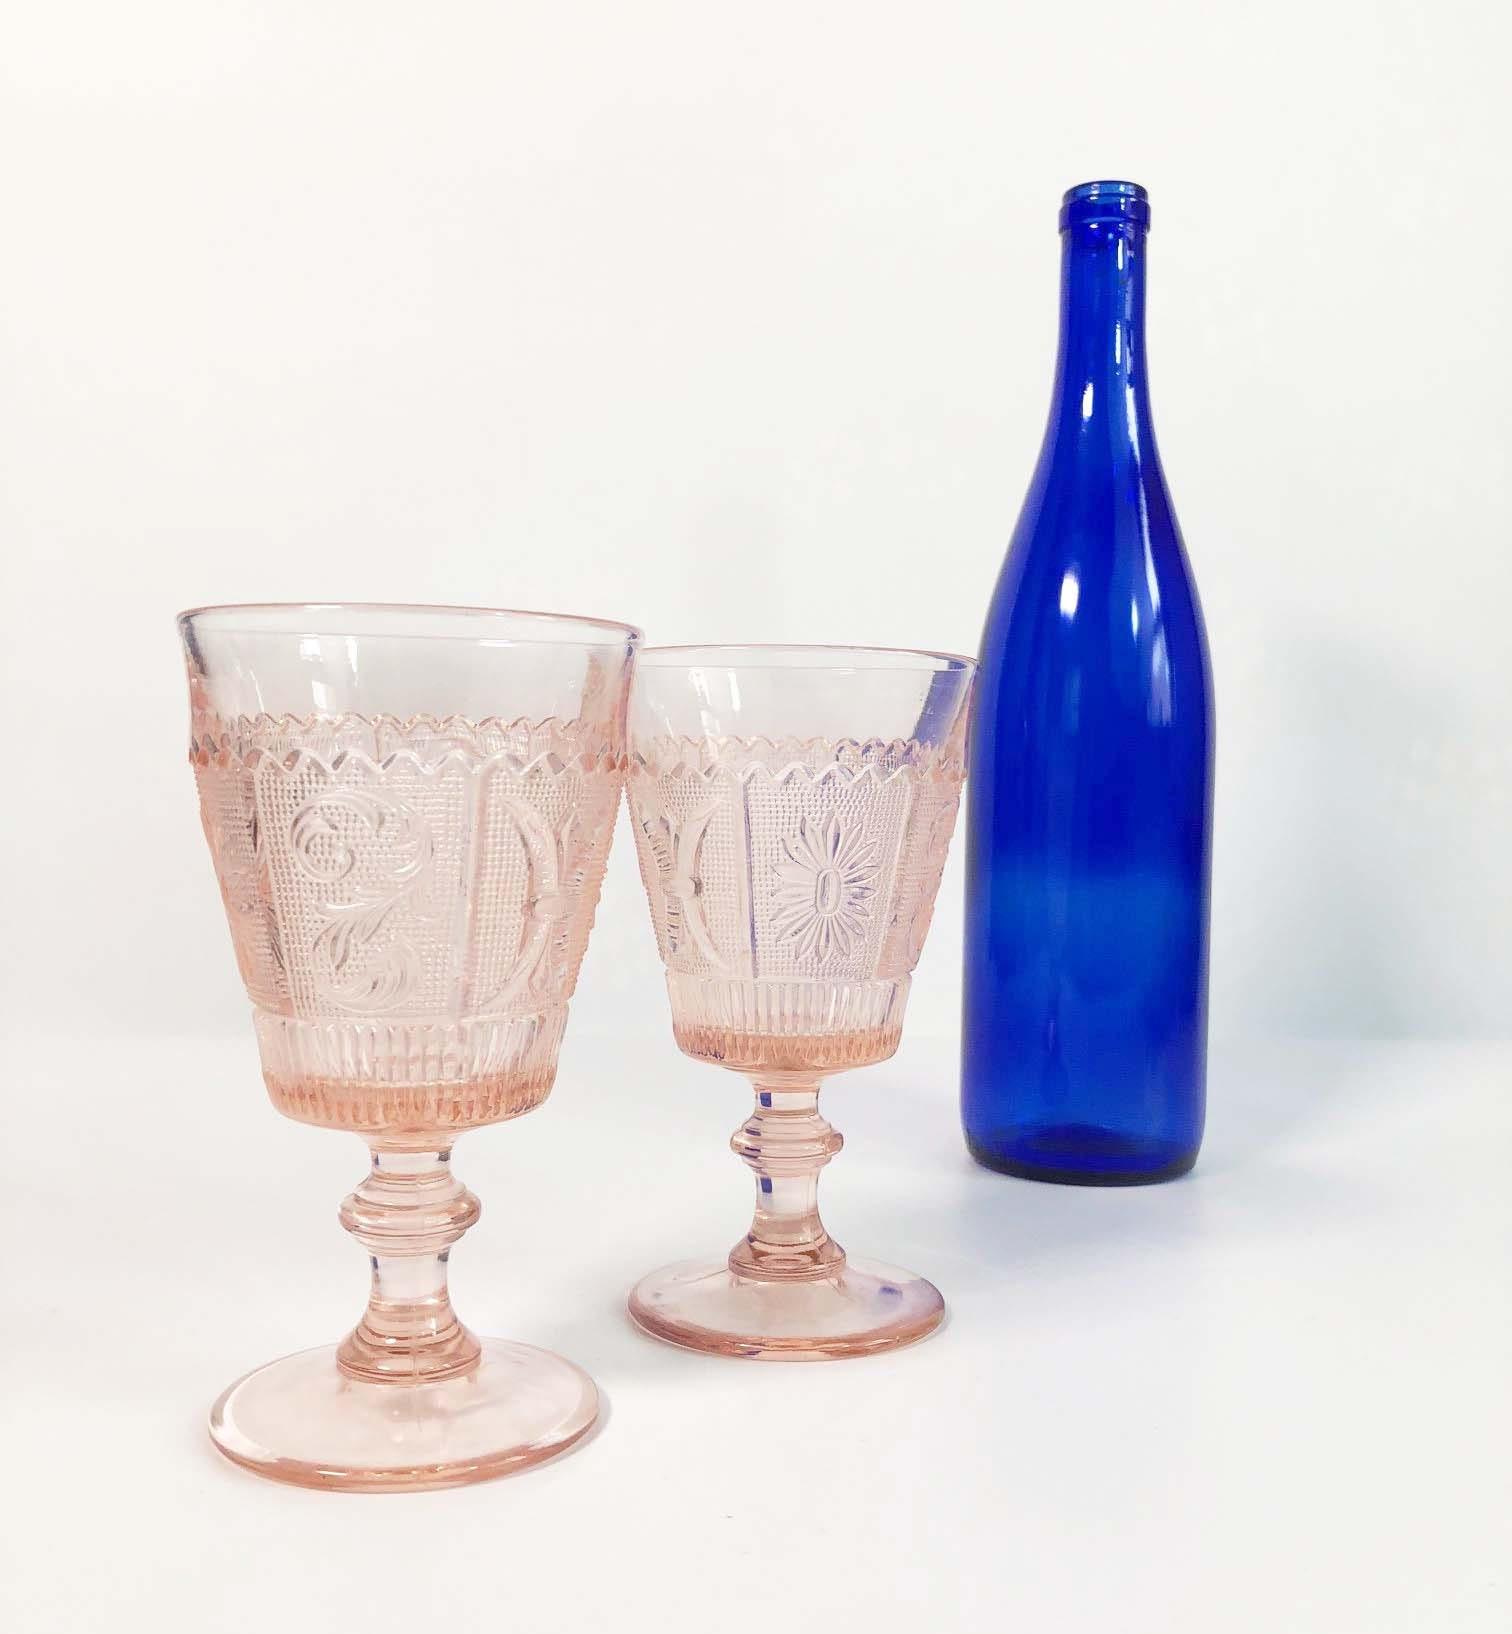 Blush Pink Wine Glasses Goblets Set Of 2 Panel Design Vintage Depression Glass Antique Glassware Eapg Early American Pressed Glass 1930s